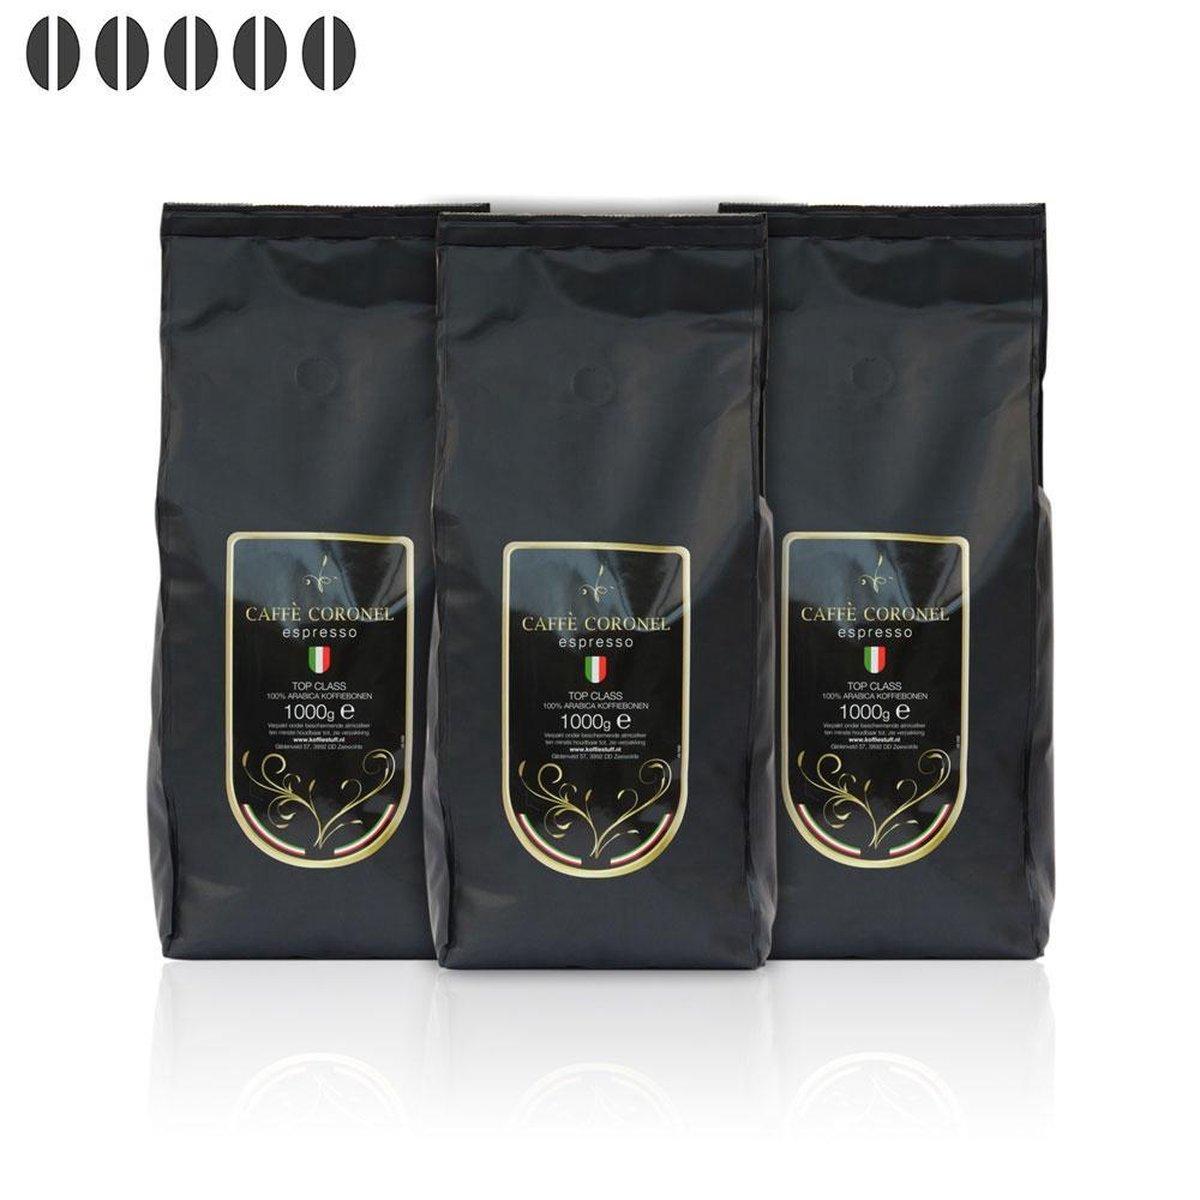 Caffe Coronel Top Class 3 kg koffiebonen - Caffe Coronel